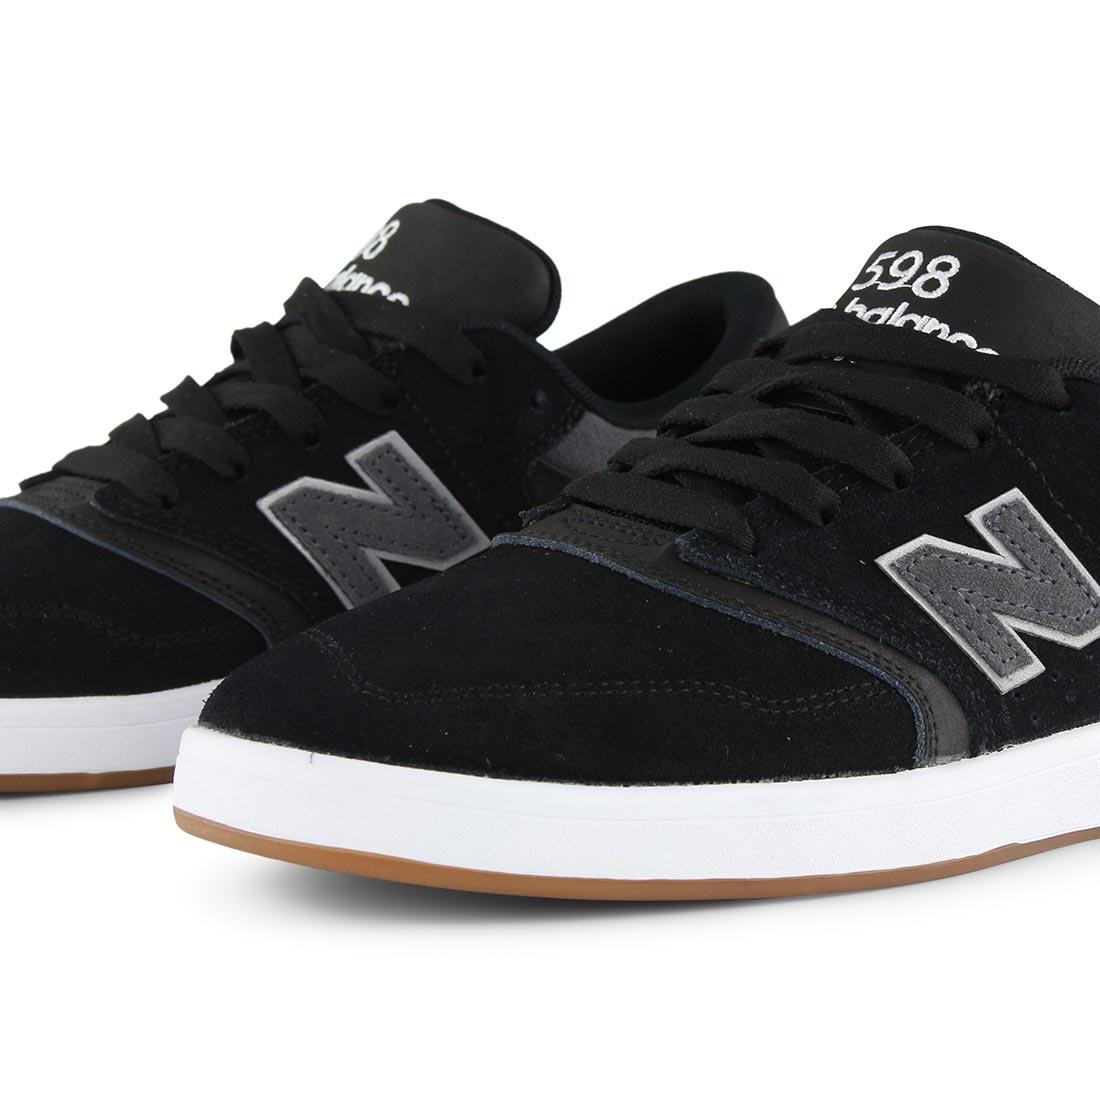 New Balance 598 Black